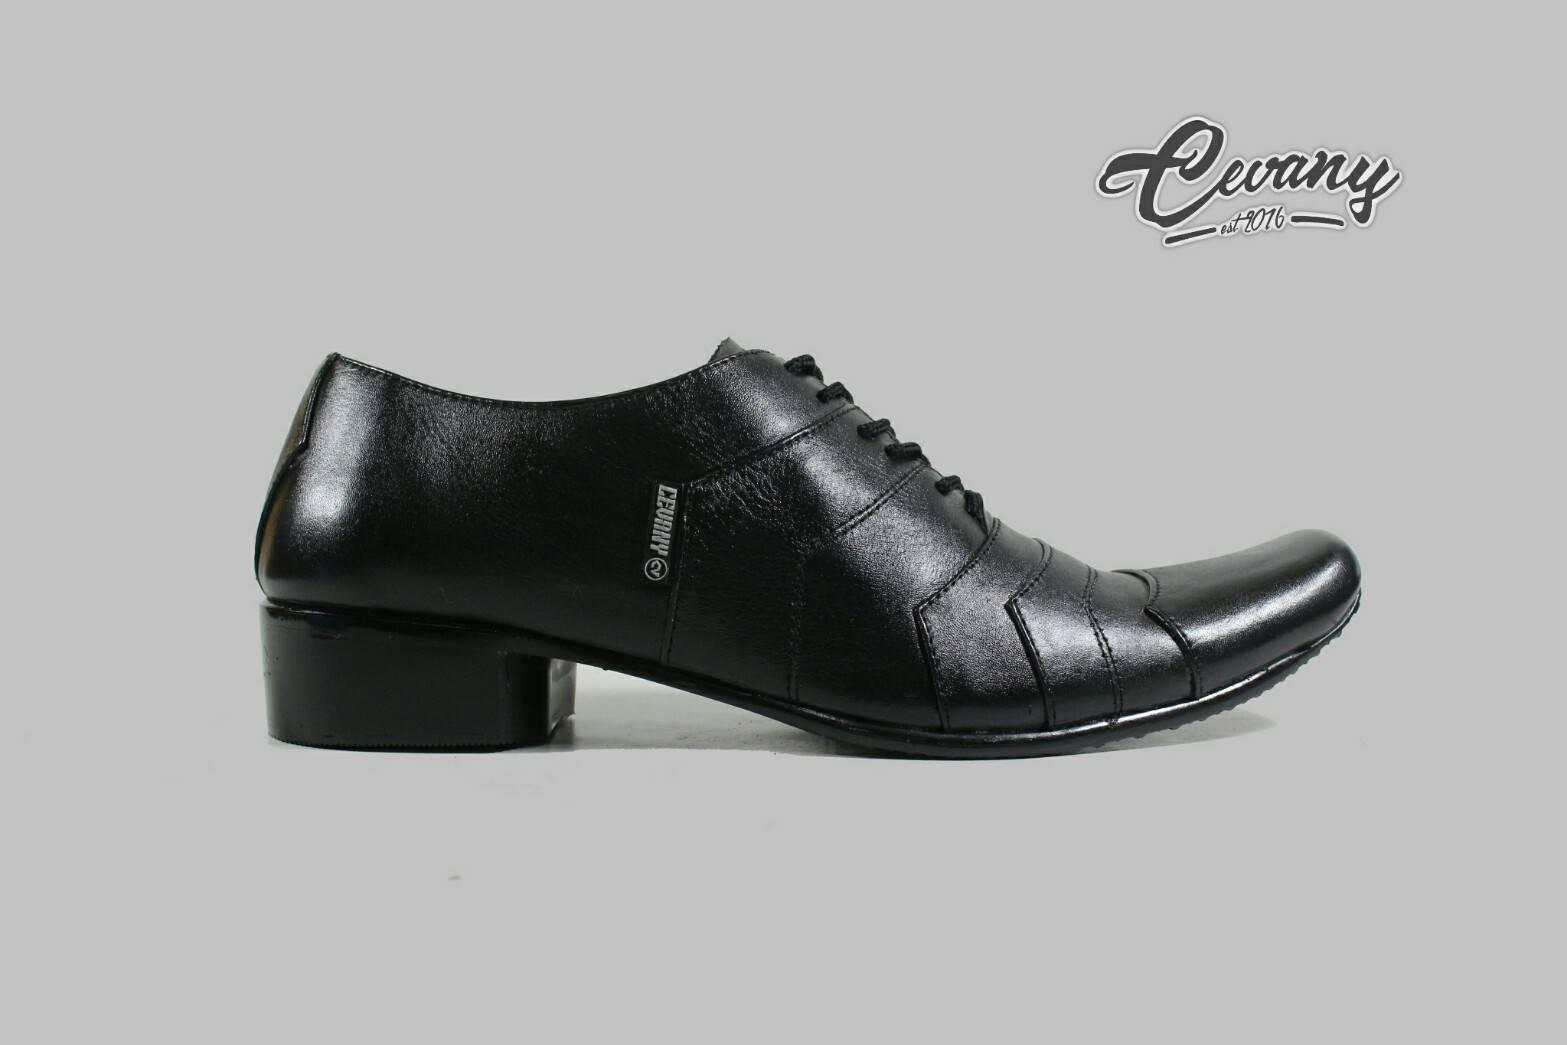 Sepatu Pantofel Pria Kulit asli premium quality original cevany footwear Lobster series leather formal shoes man